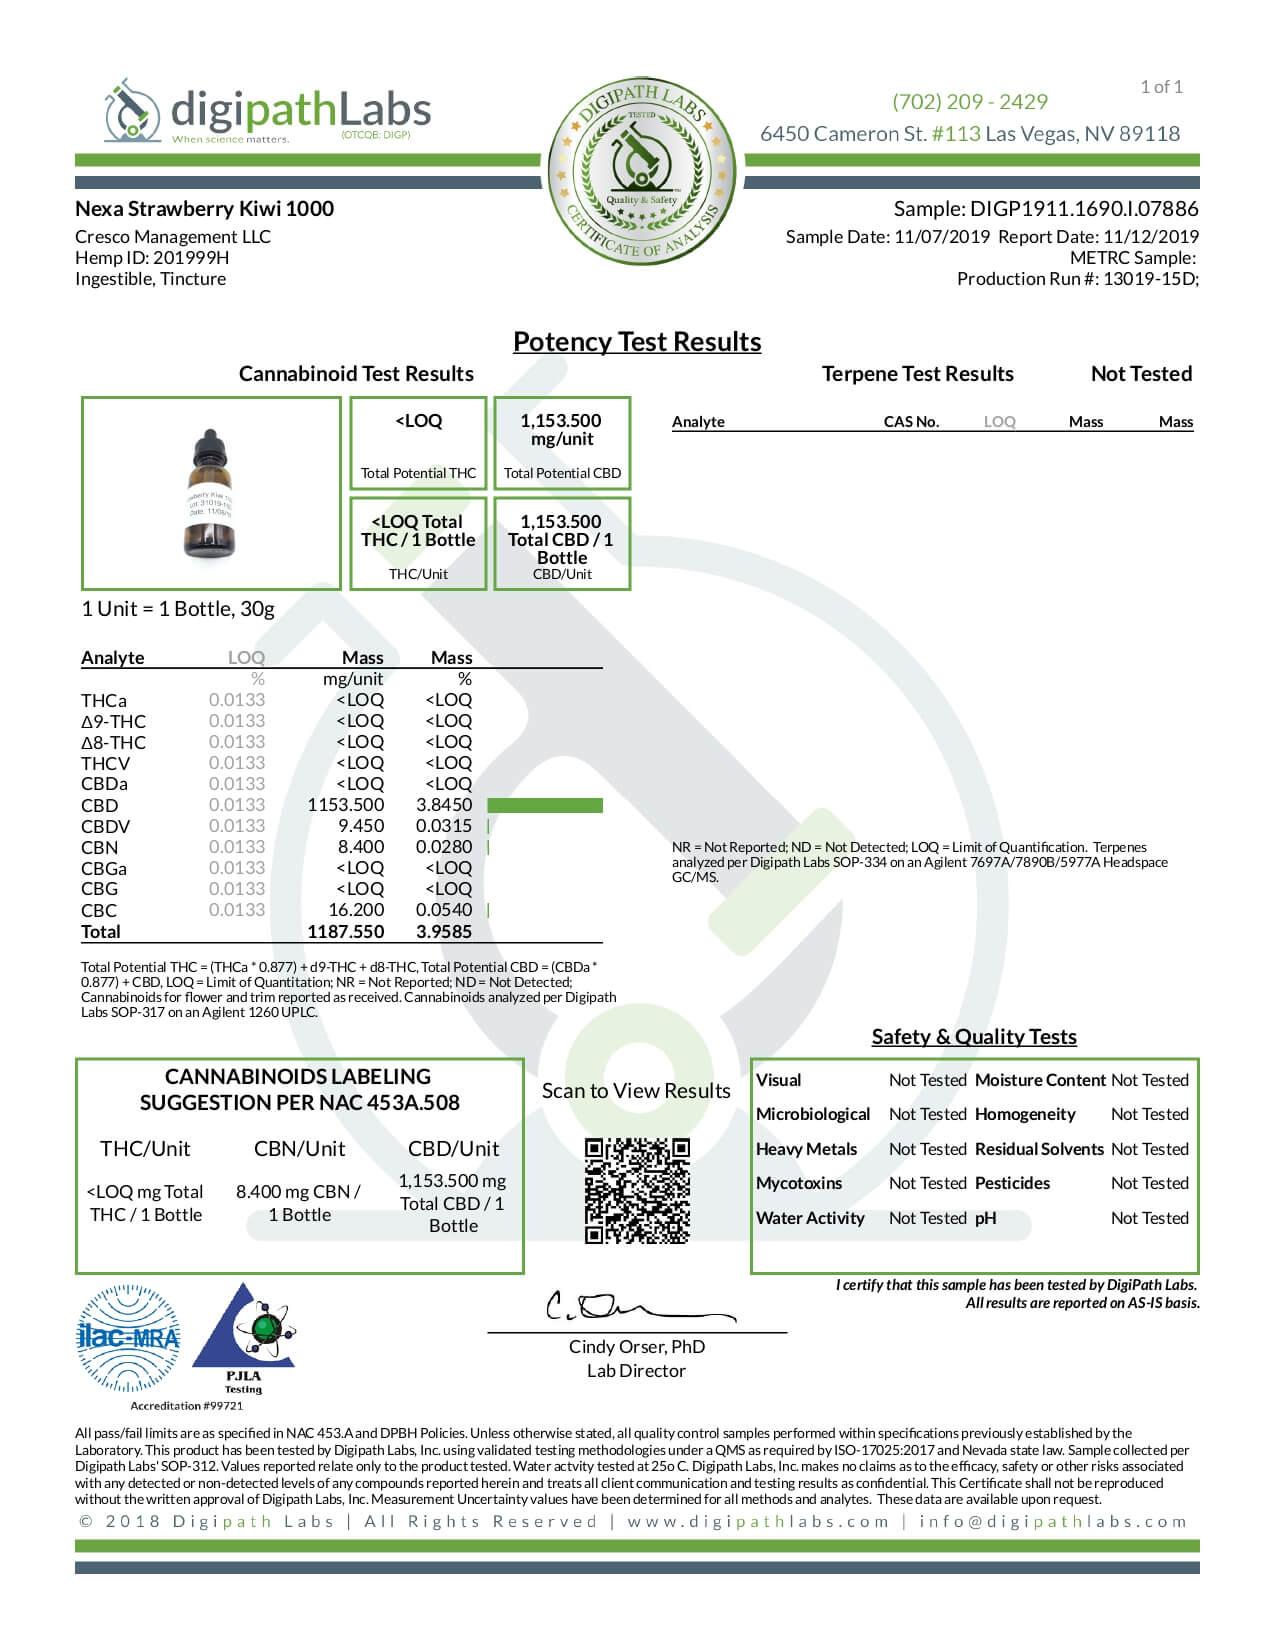 Nexa CBD Tincture Strawberry Kiwi 1000mg Lab Report